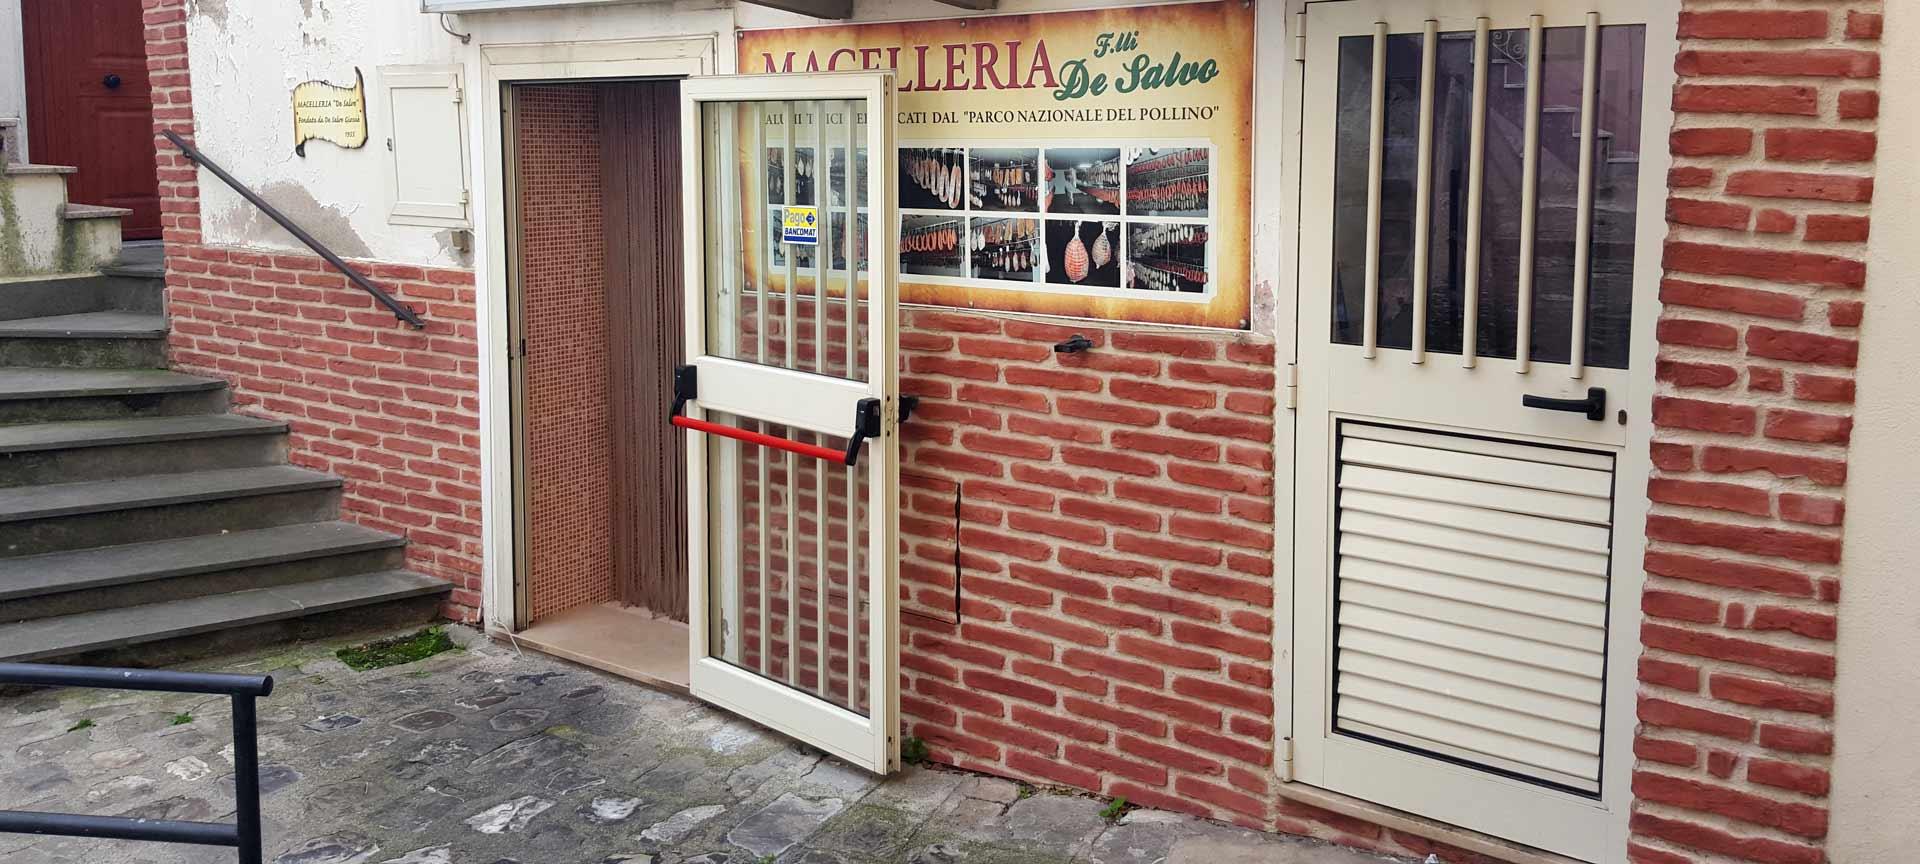 ingresso macelleria de salvo a chiaormonte parco del pollino